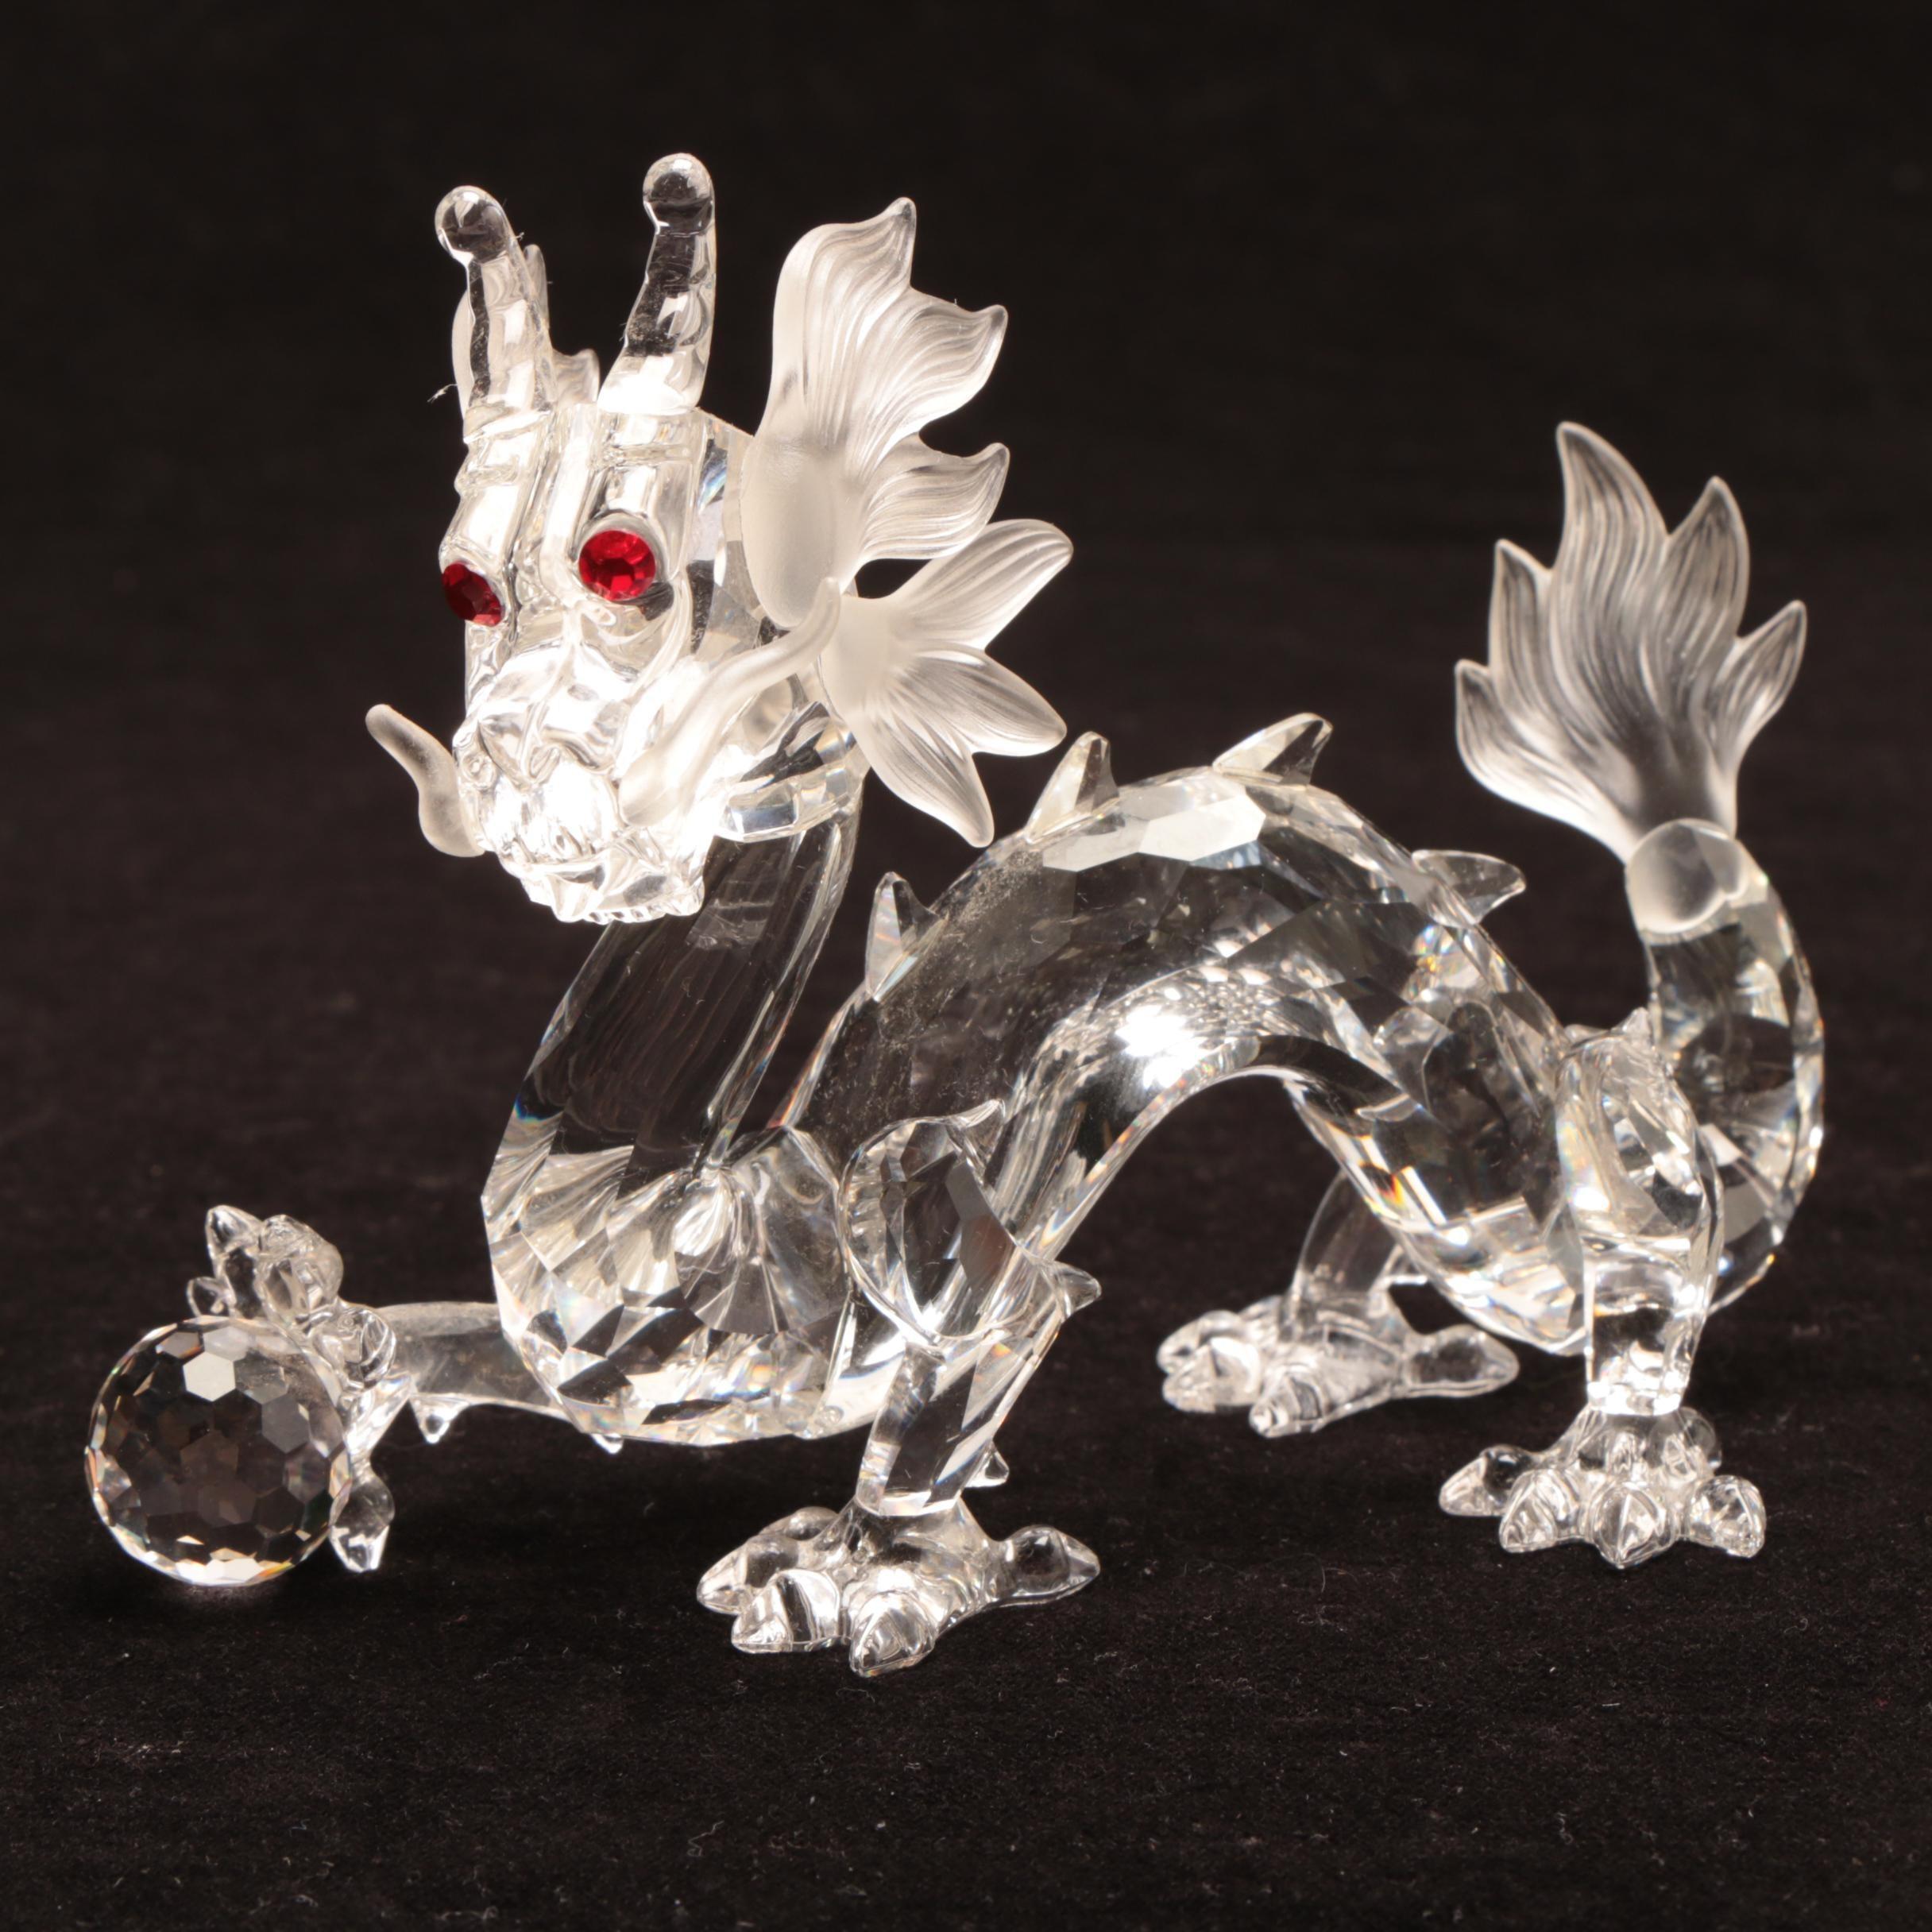 1997 Swarovski Red Eyed Dragon Glass Figurine With Original Case and Box